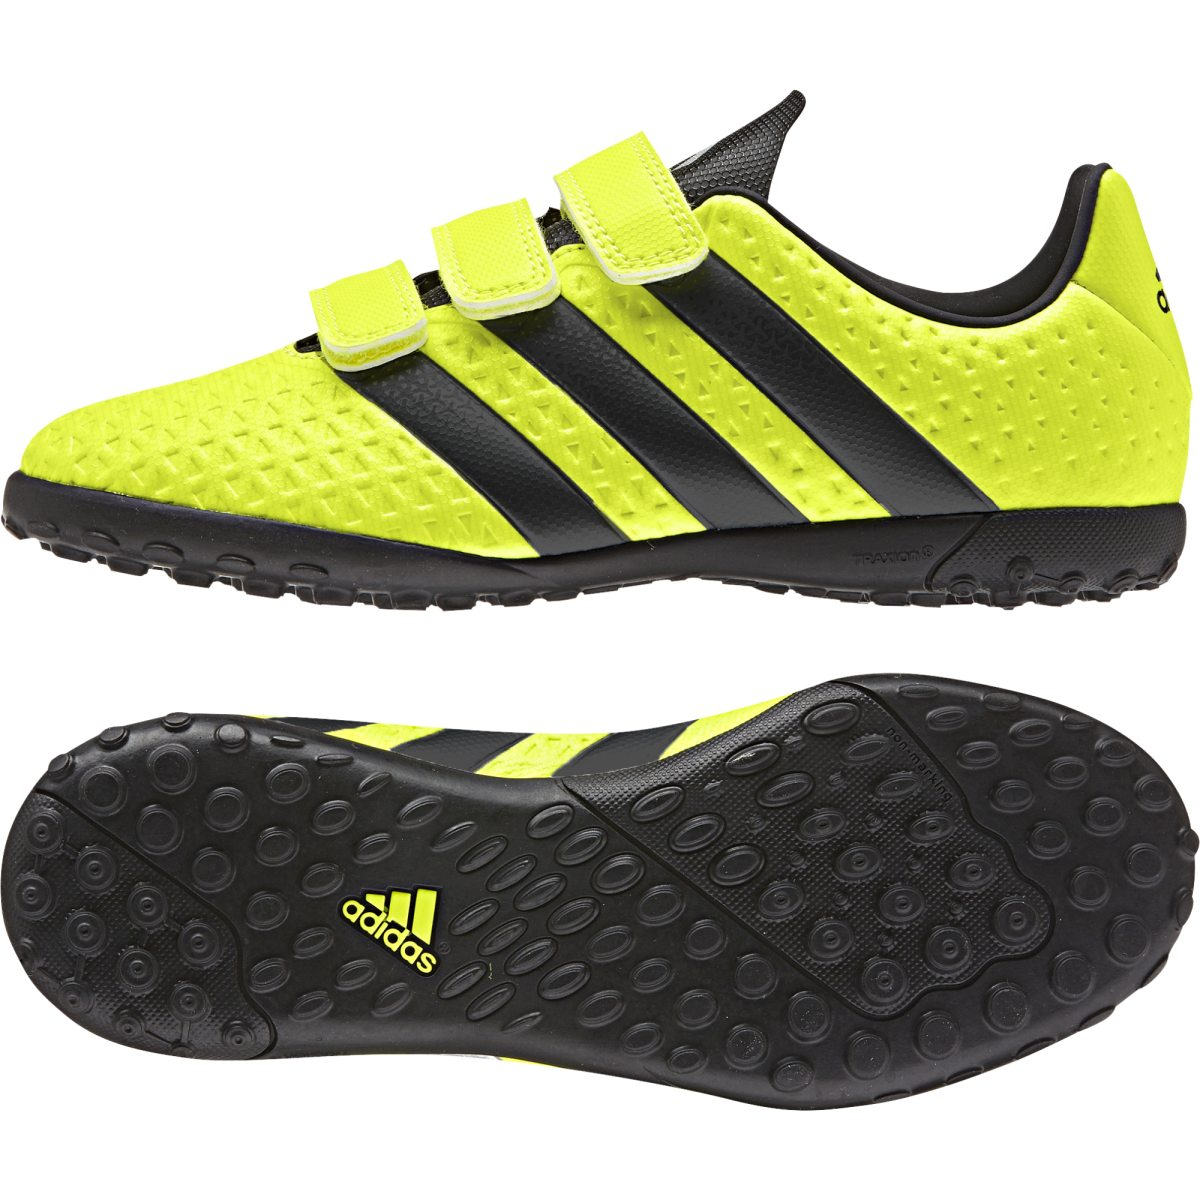 new product 00db4 670ad adidas ace 16.4 turf fotballsko barn no